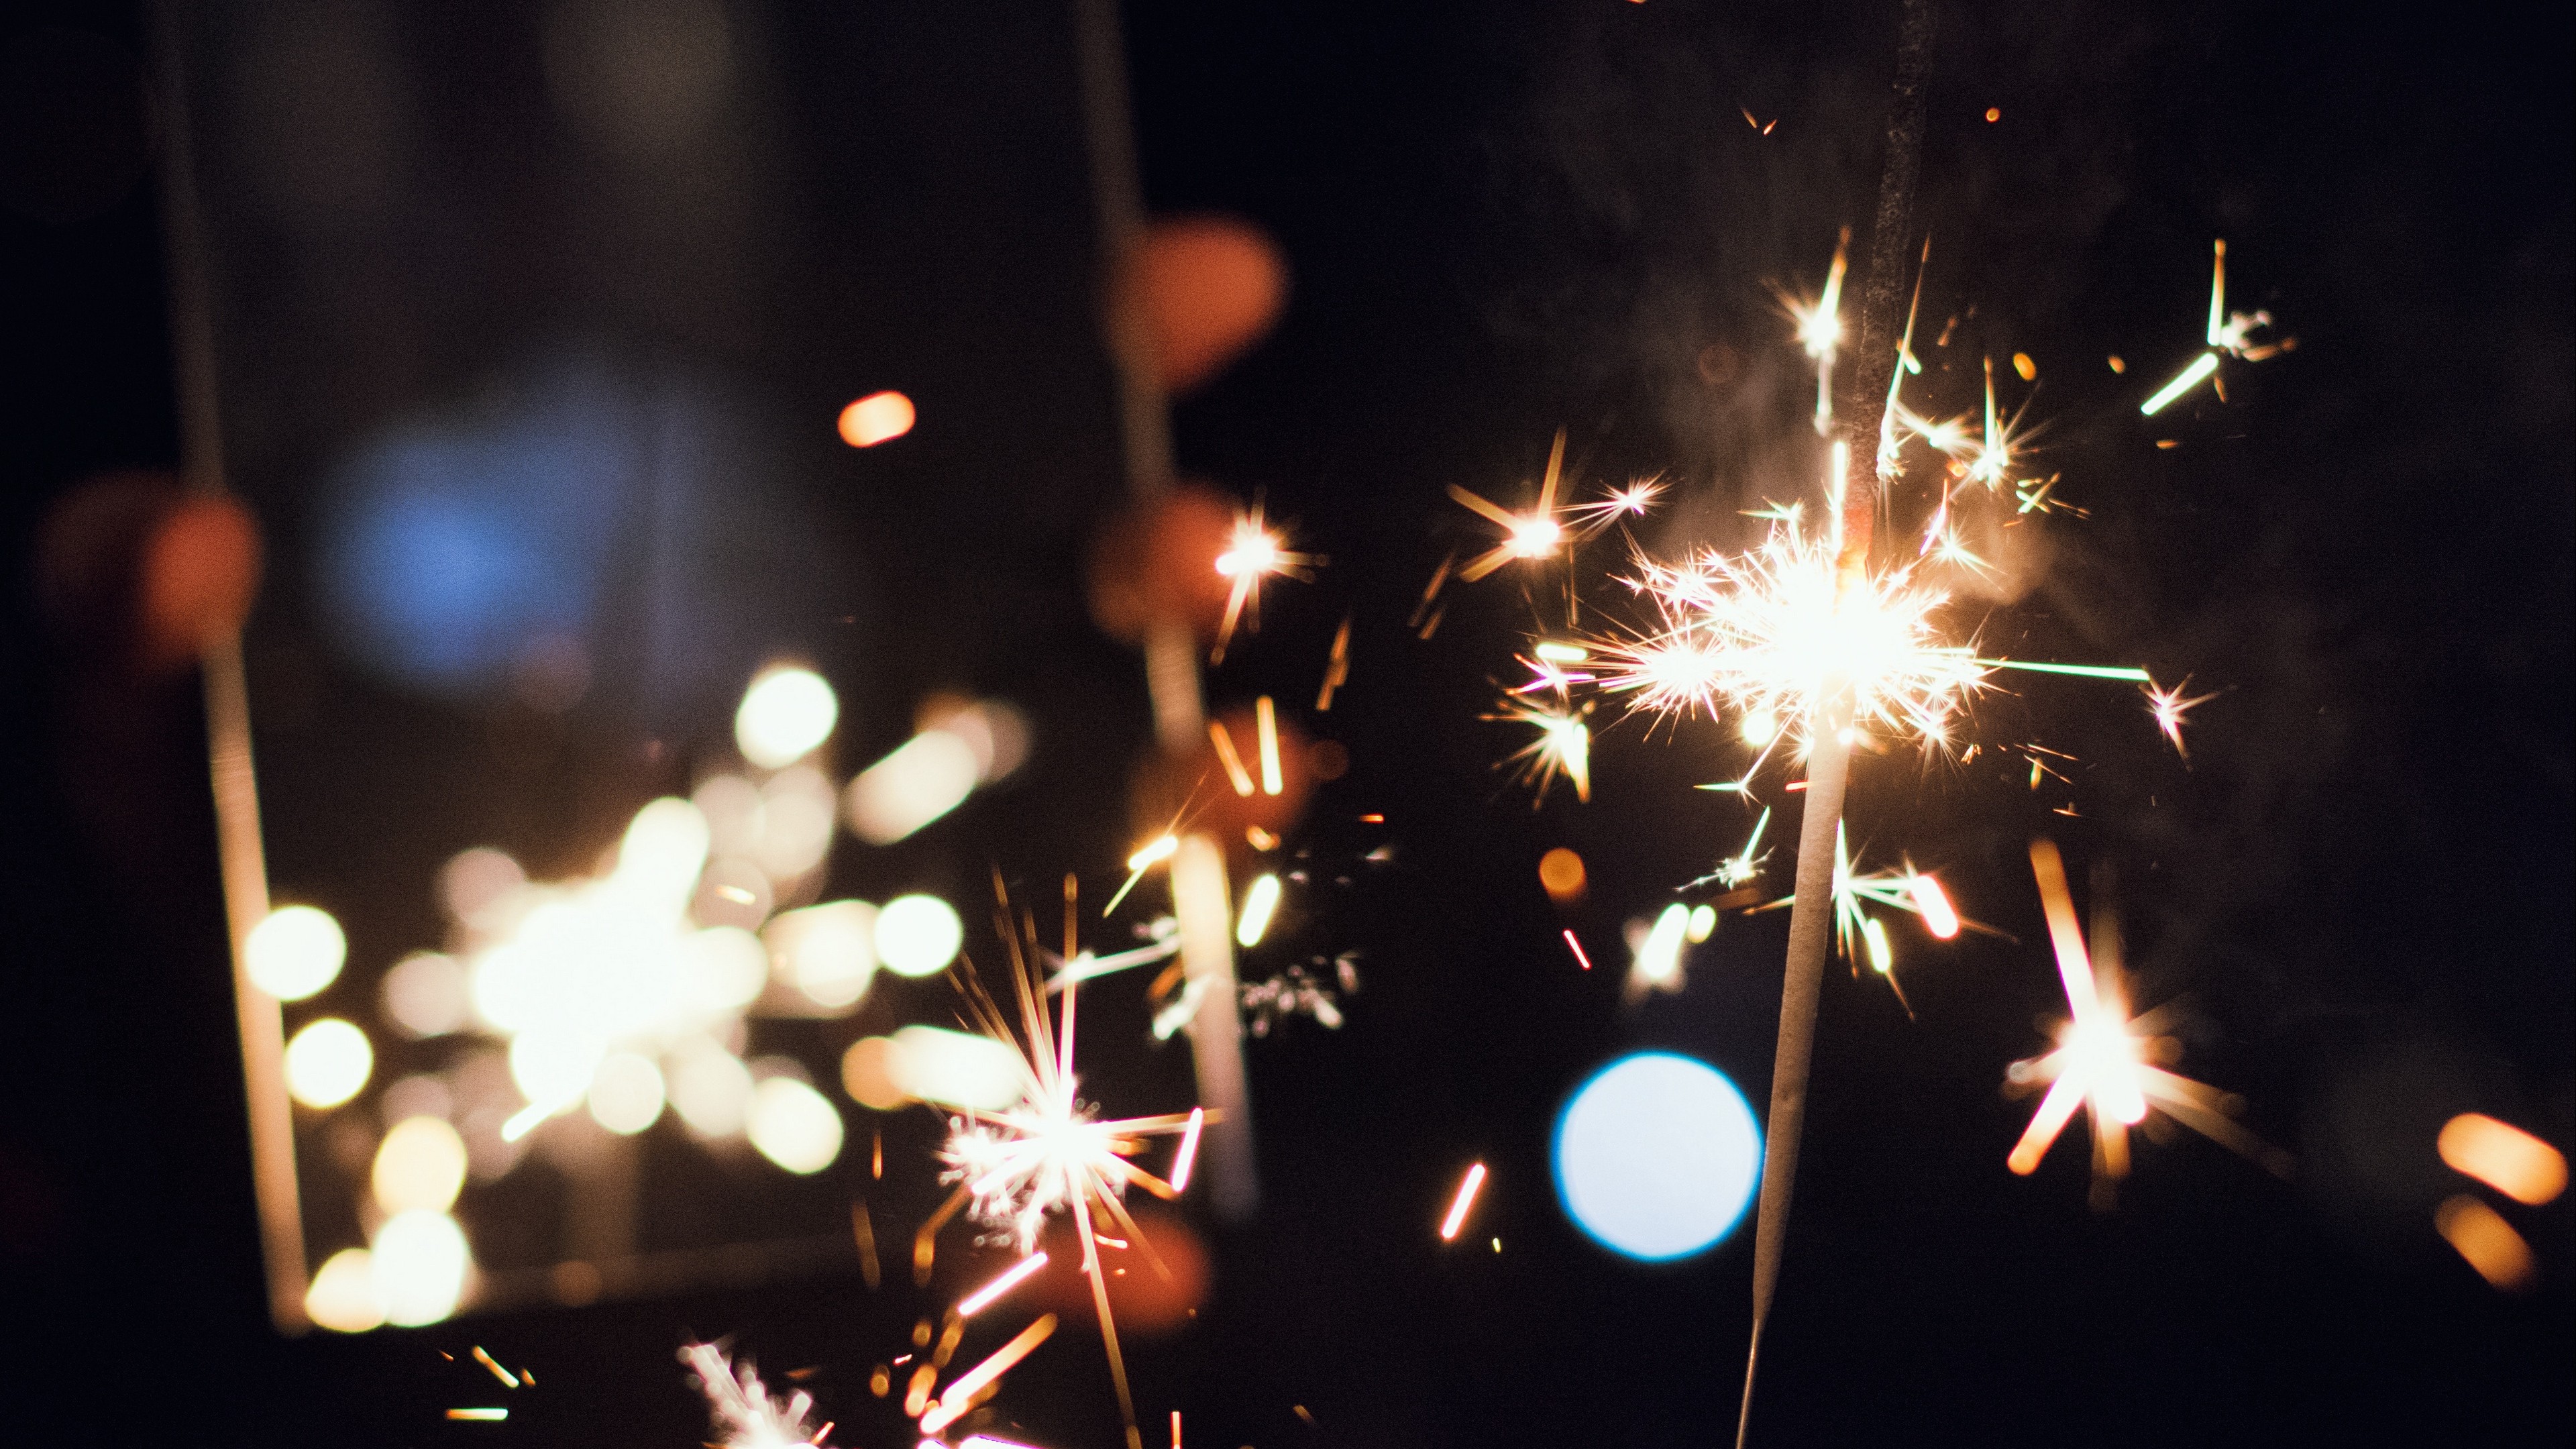 bengal fire sparkle sparks 4k 1538344838 - bengal fire, sparkle, sparks 4k - Sparks, Sparkle, bengal fire